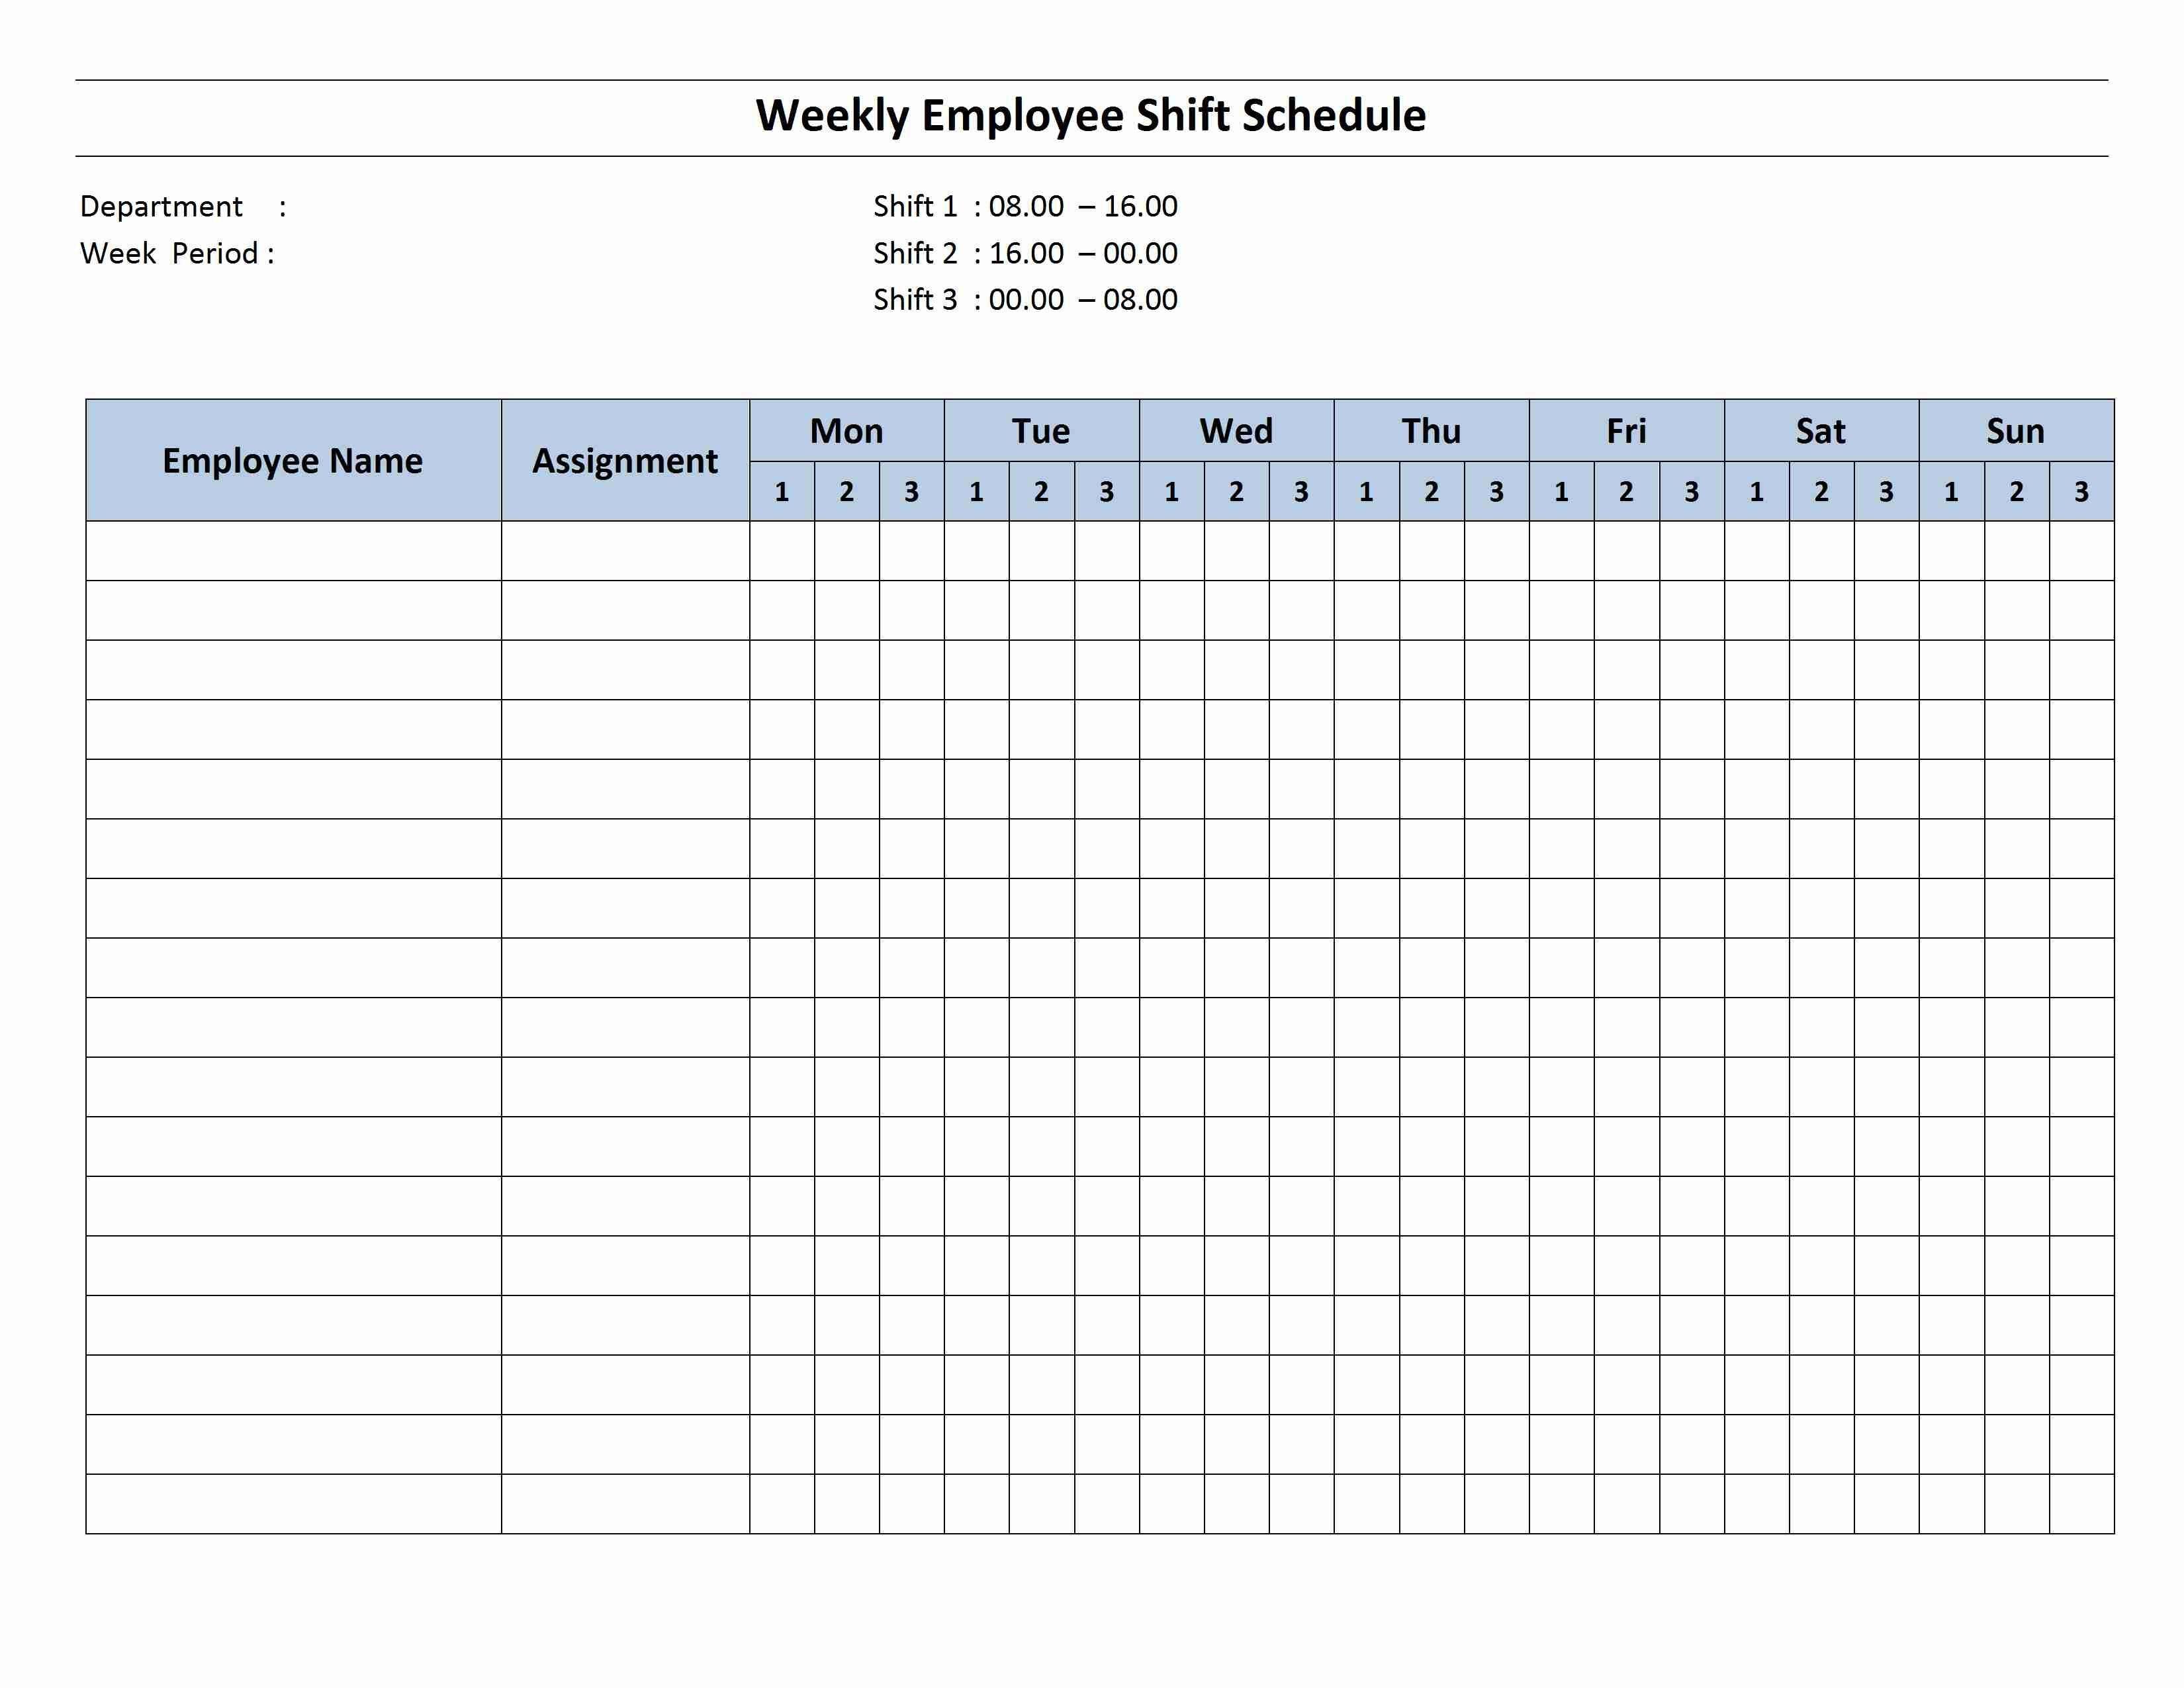 004 Striking Employee Schedule Template Free Image  Downloadable Weekly Work Training Excel ShiftFull